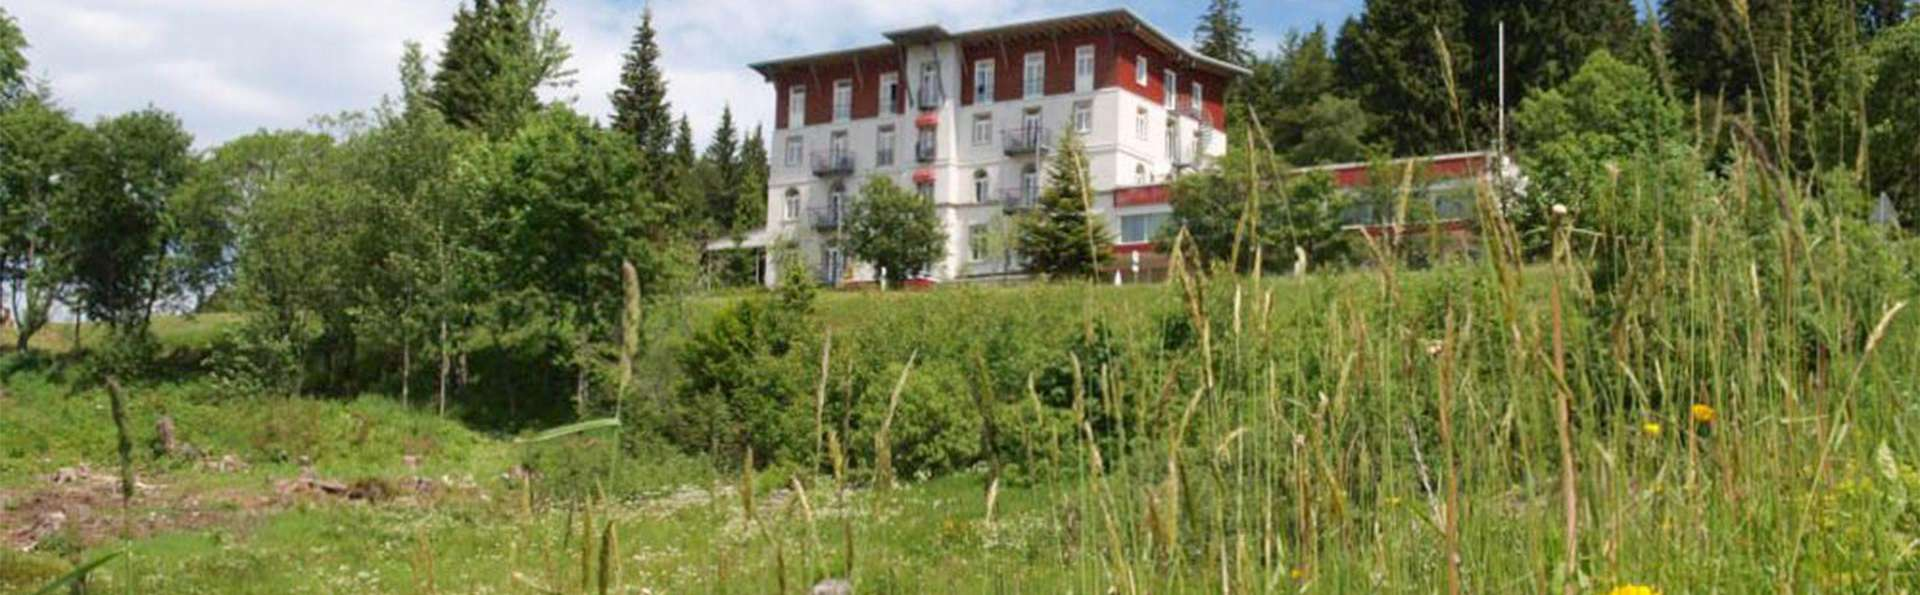 Waldhotel am Notschreipass - EDIT_SURROUNDING_10.jpg